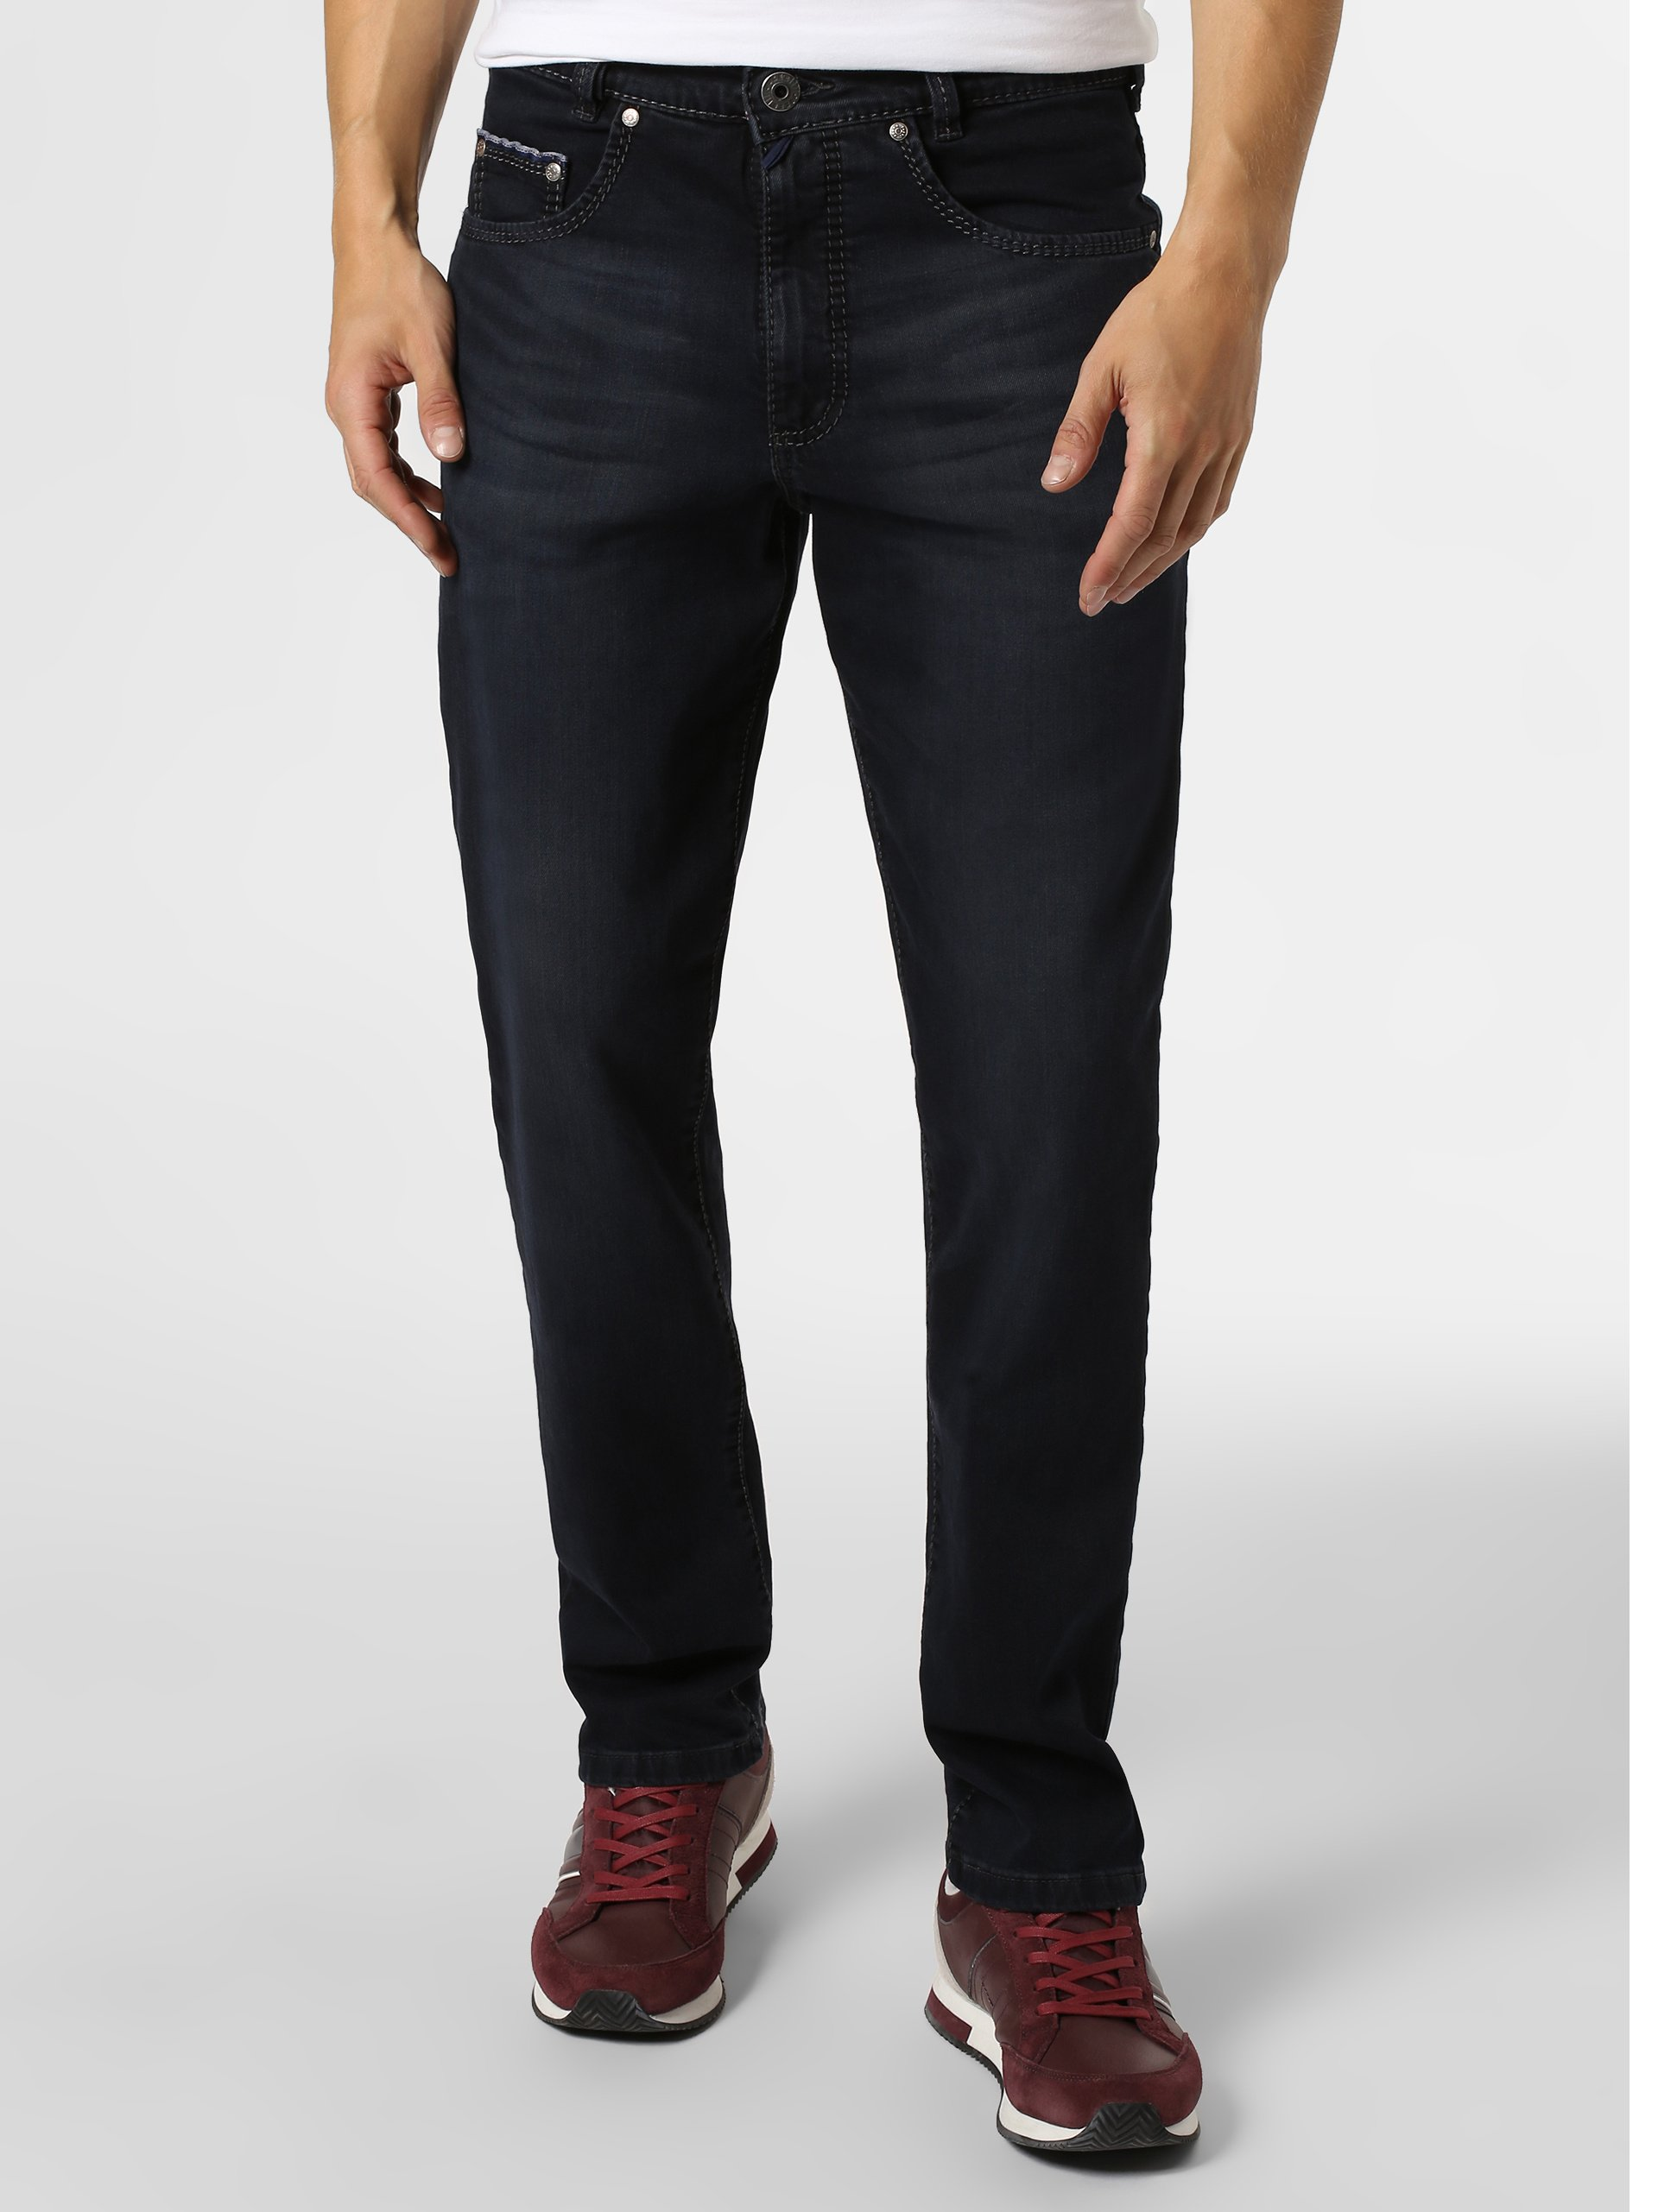 Joker Herren Jeans